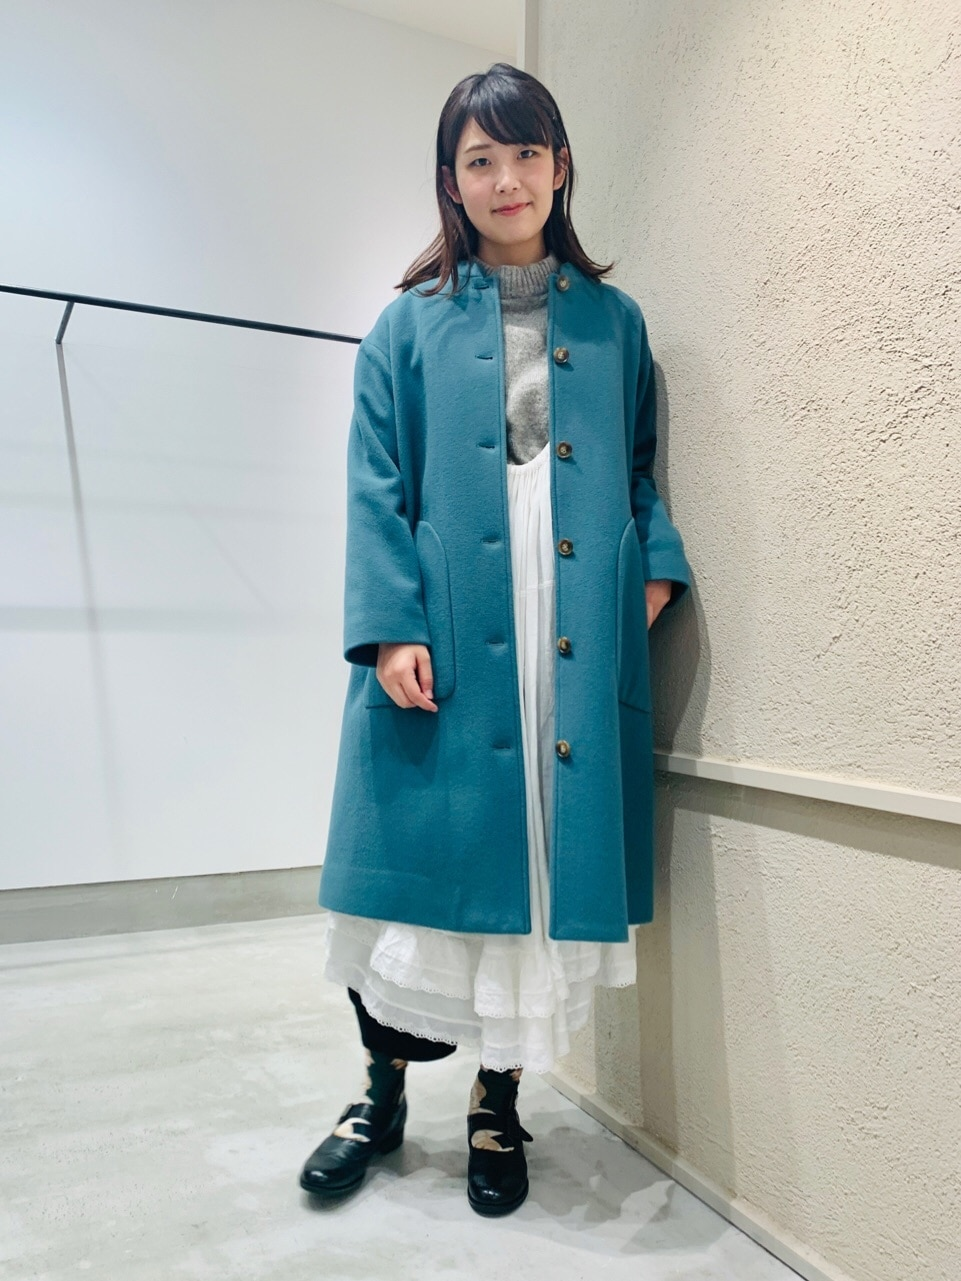 chambre de charme 横浜ジョイナス 身長:162cm 2020.11.10